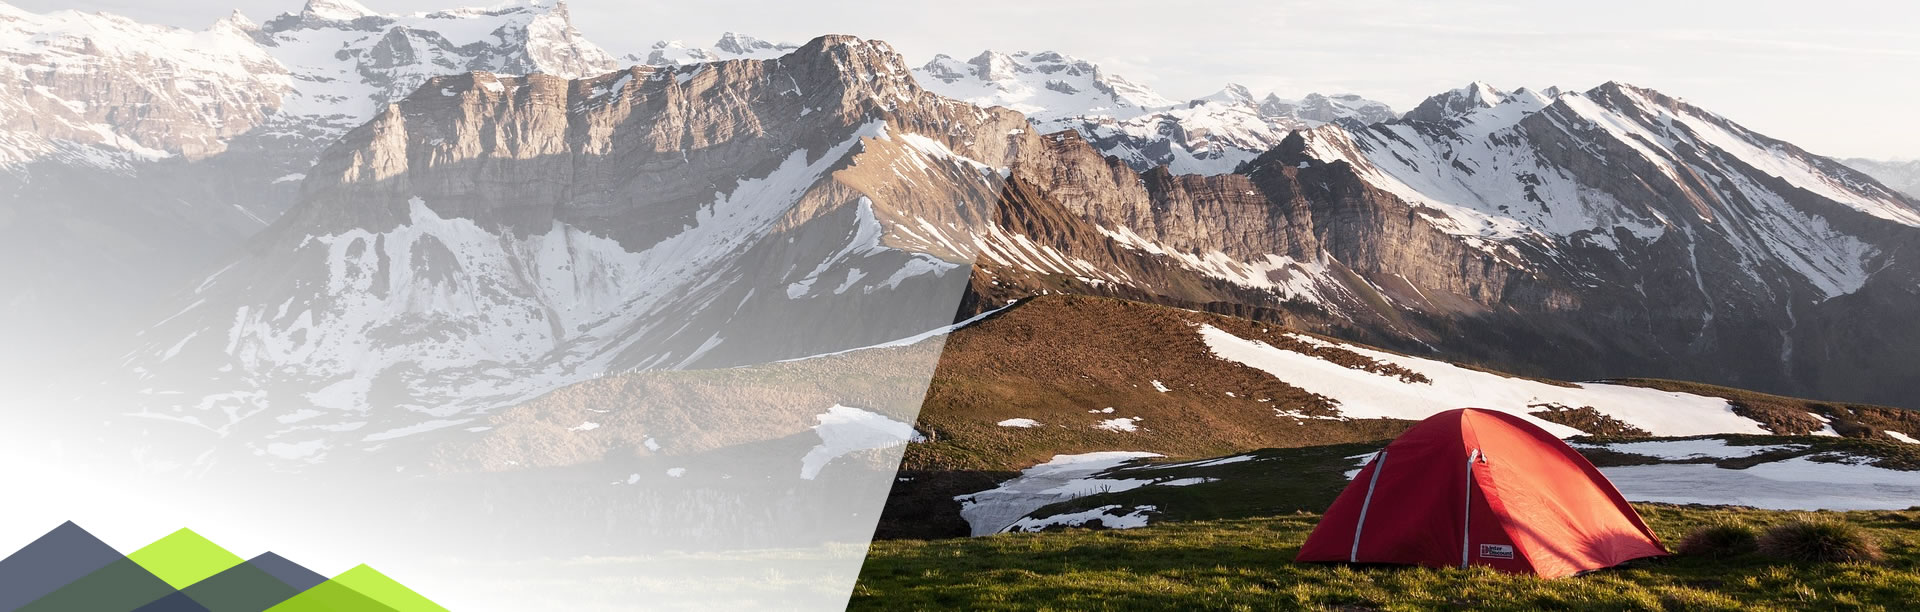 Bergsportler